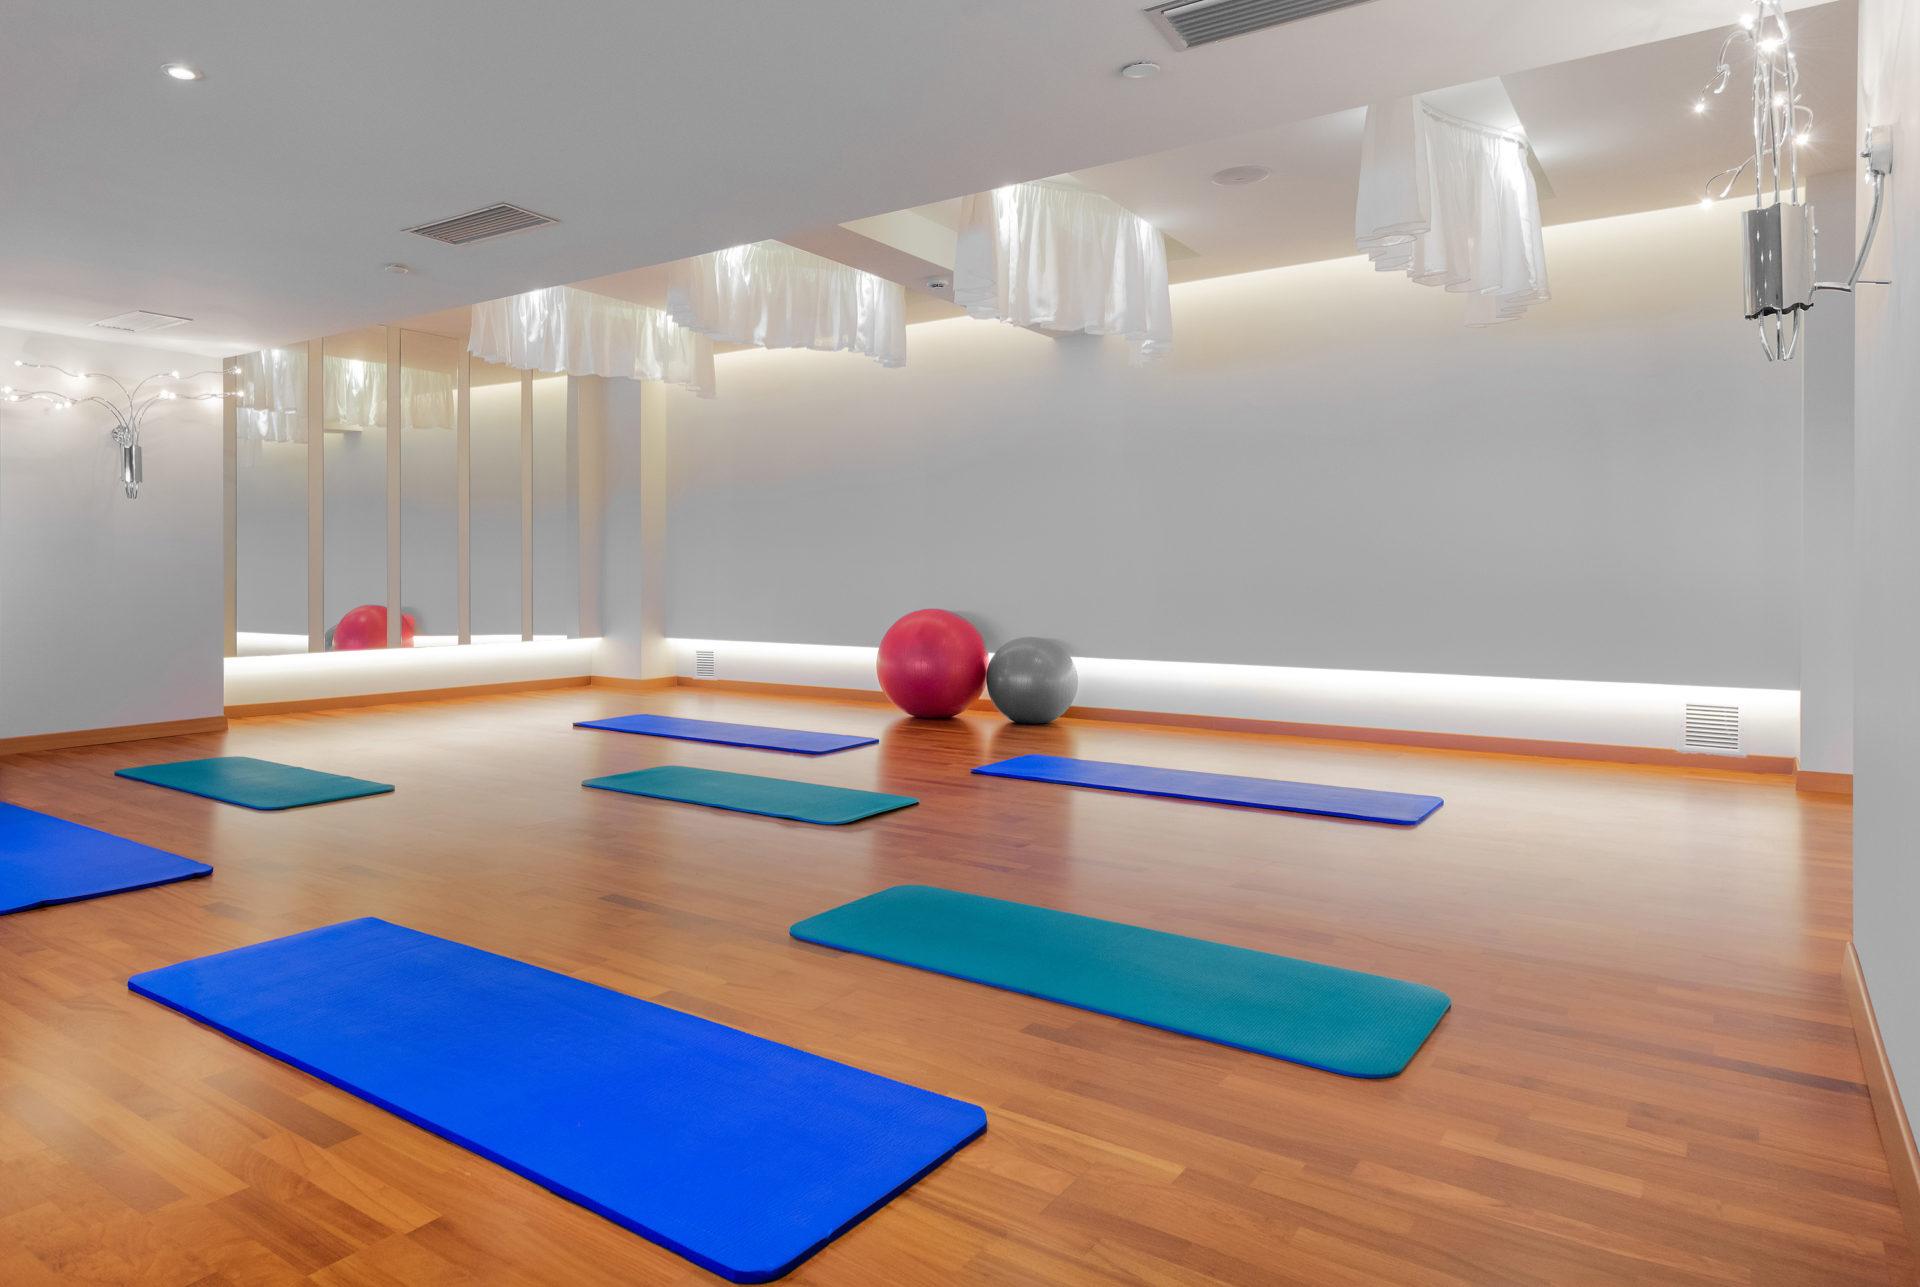 72A_8187_Yoga-Pilates_studio_ELYSIUM